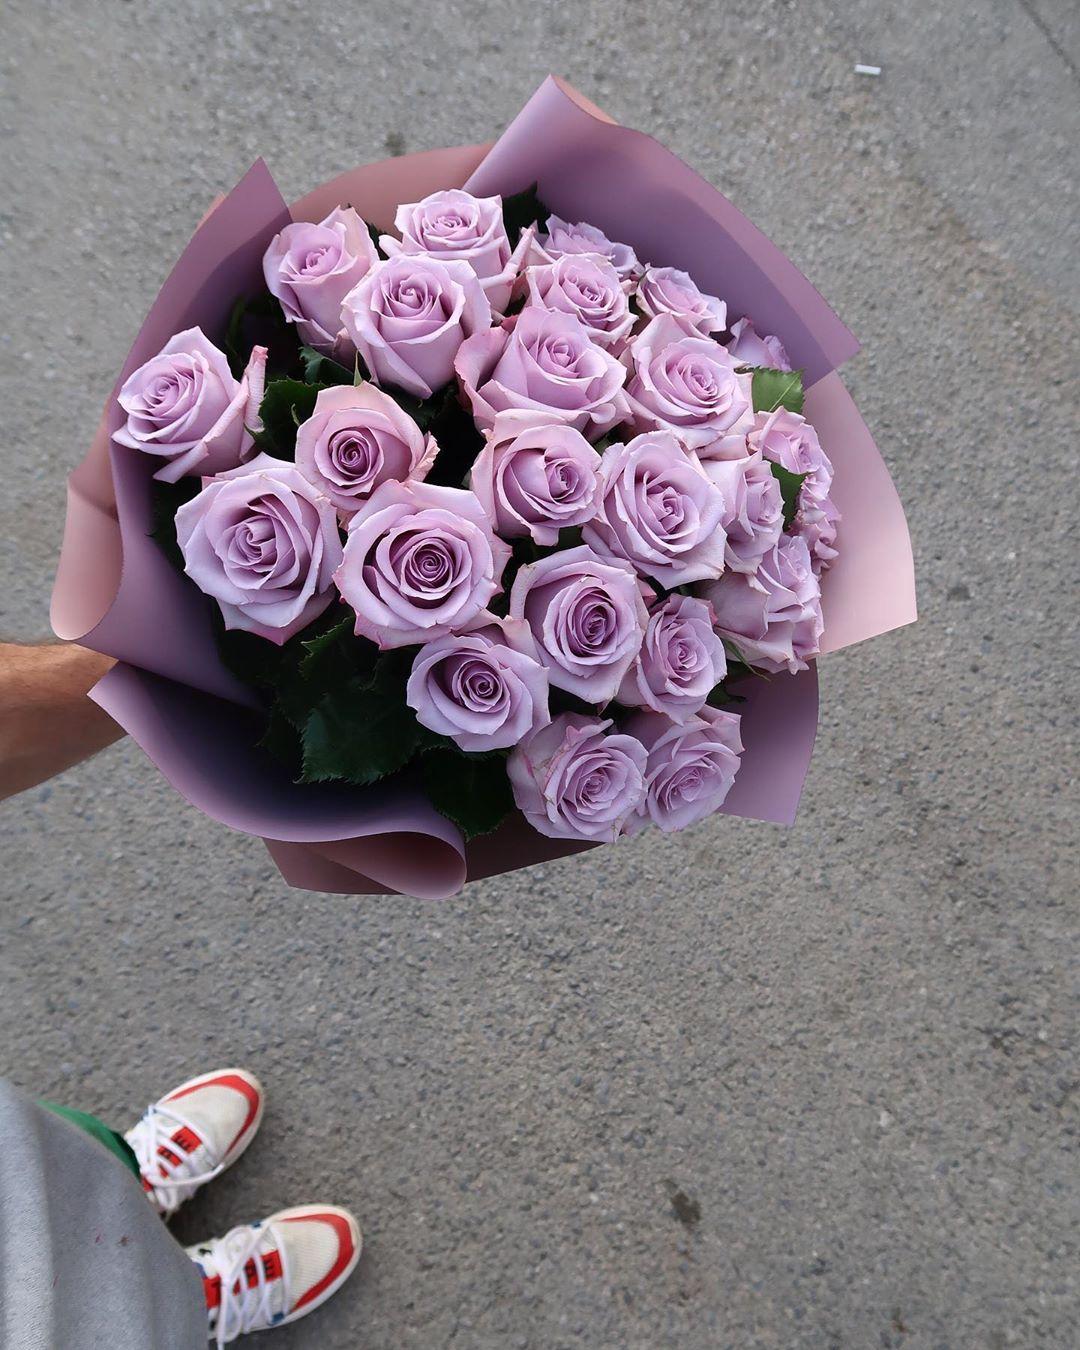 Заказ и доставка моно букетов цветов в Ростове-на-Дону